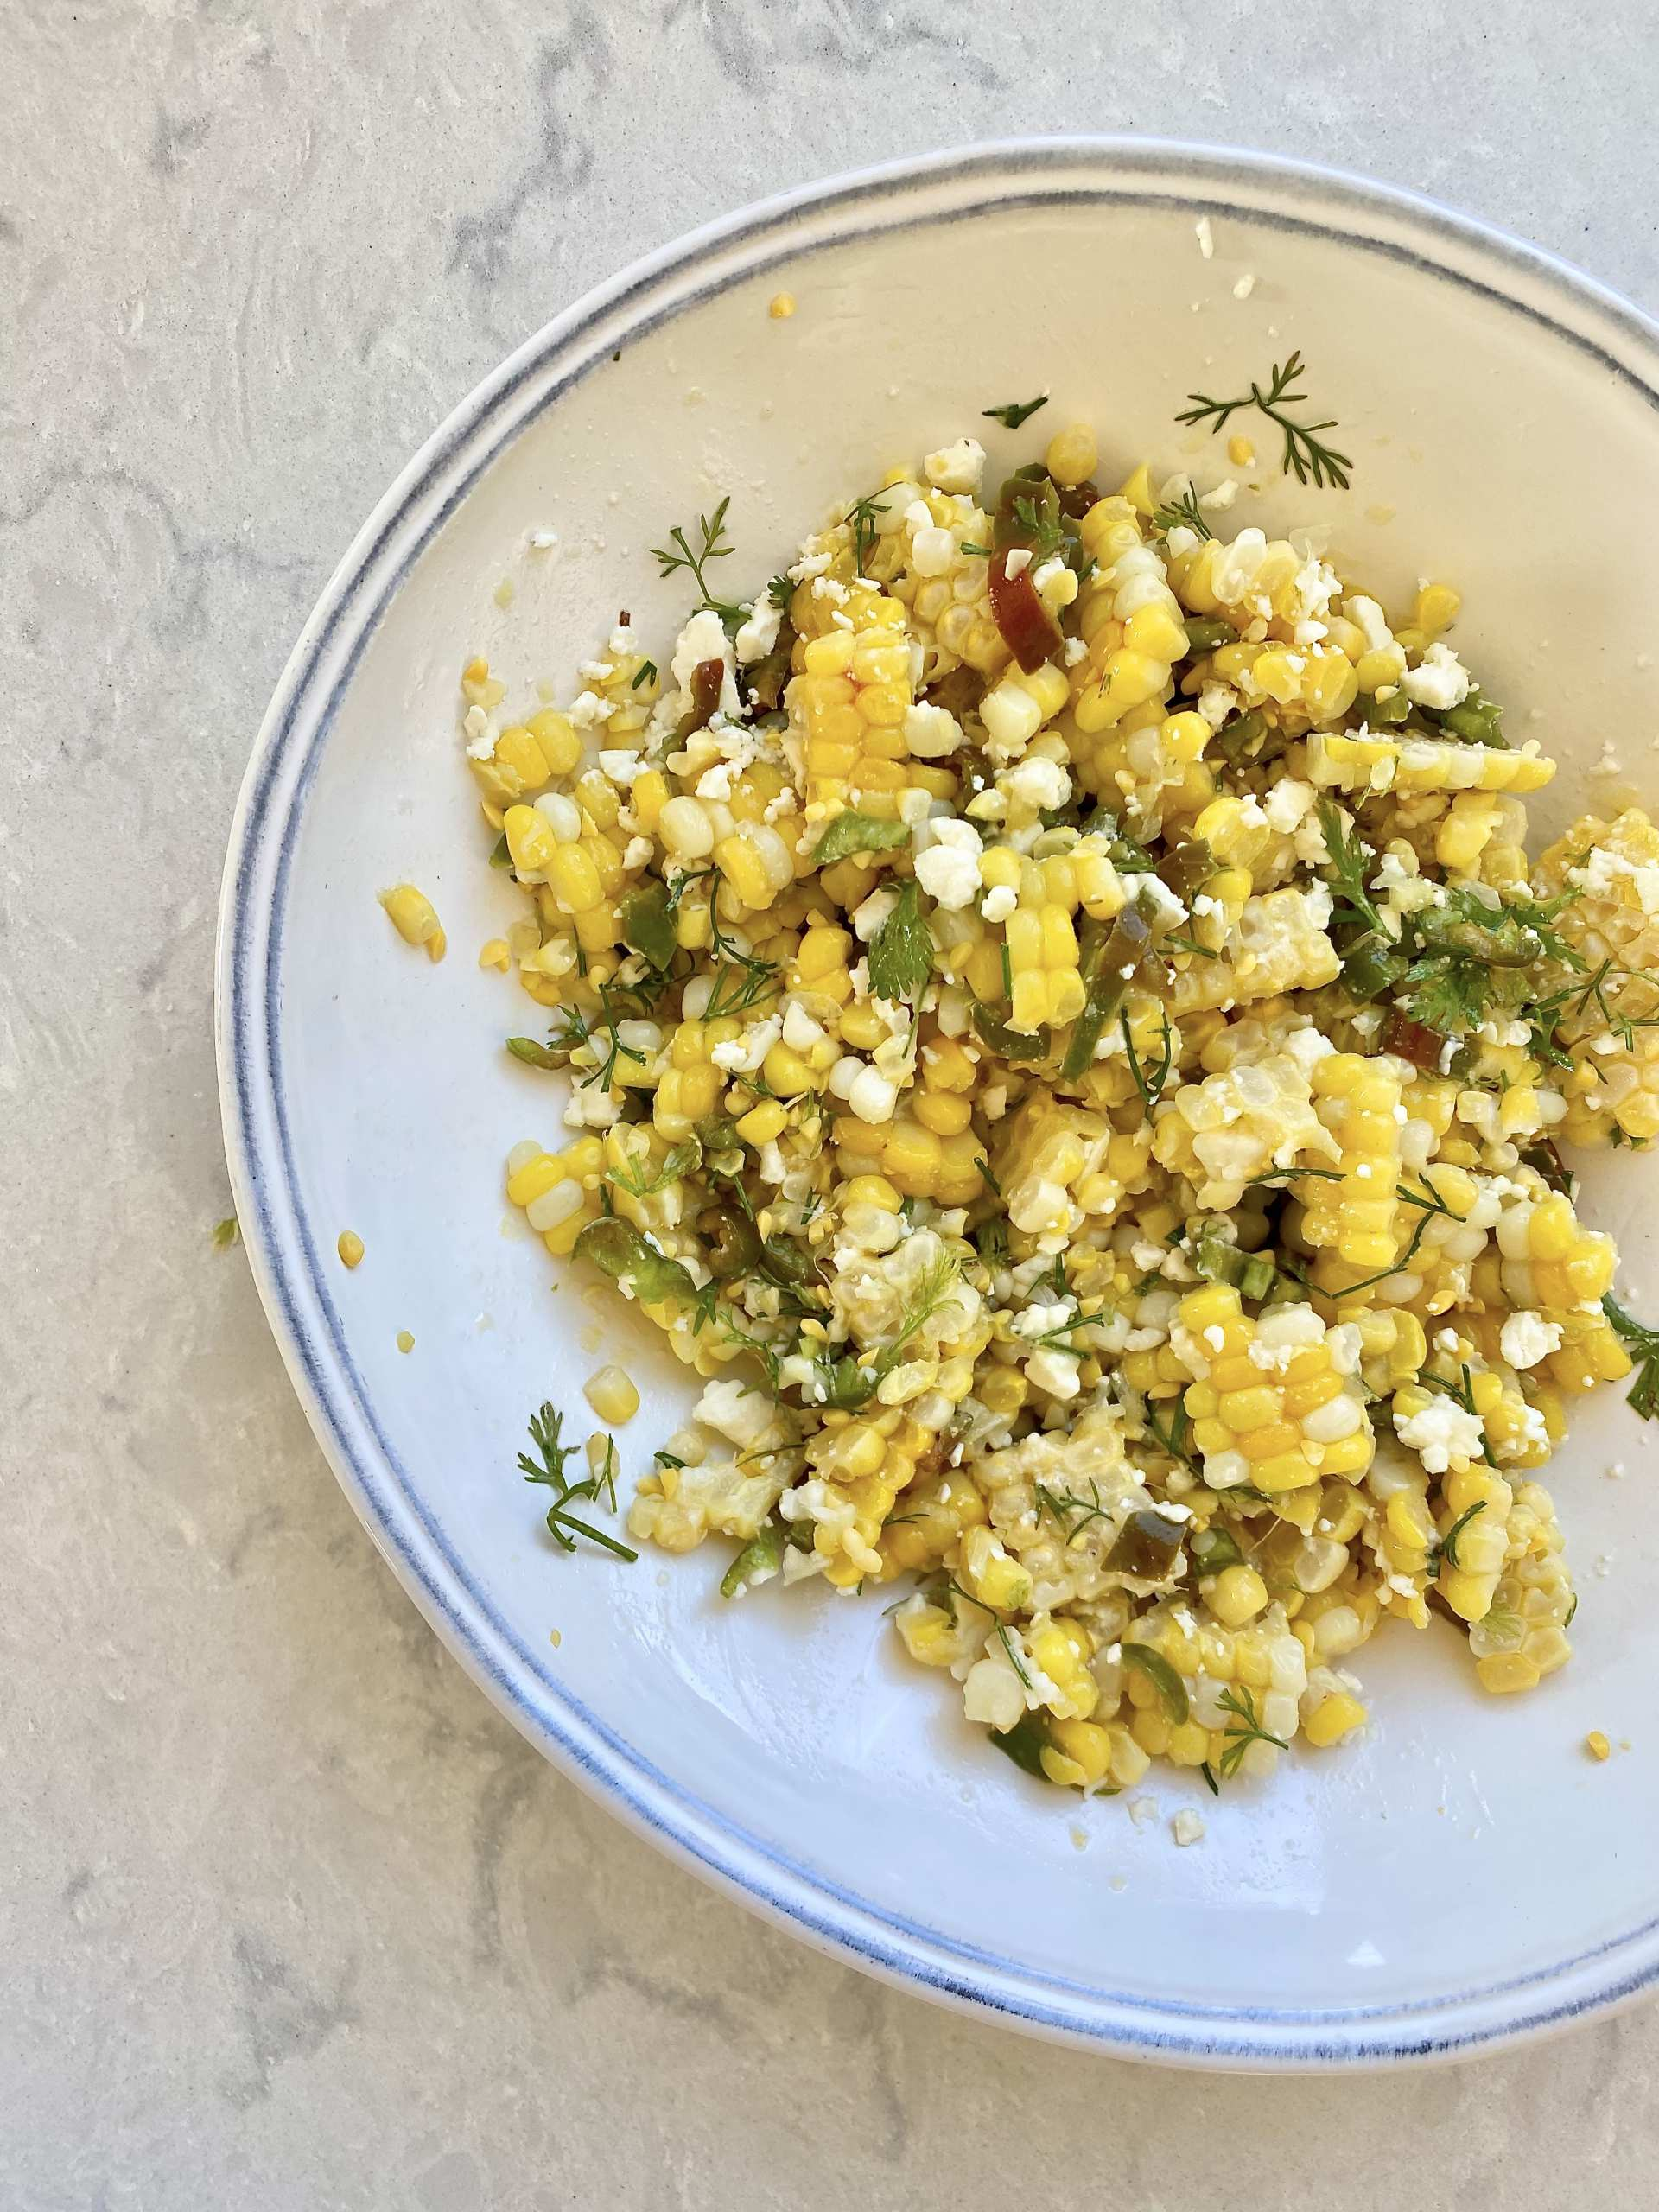 Grilled corn salad - corn salad in a bowl